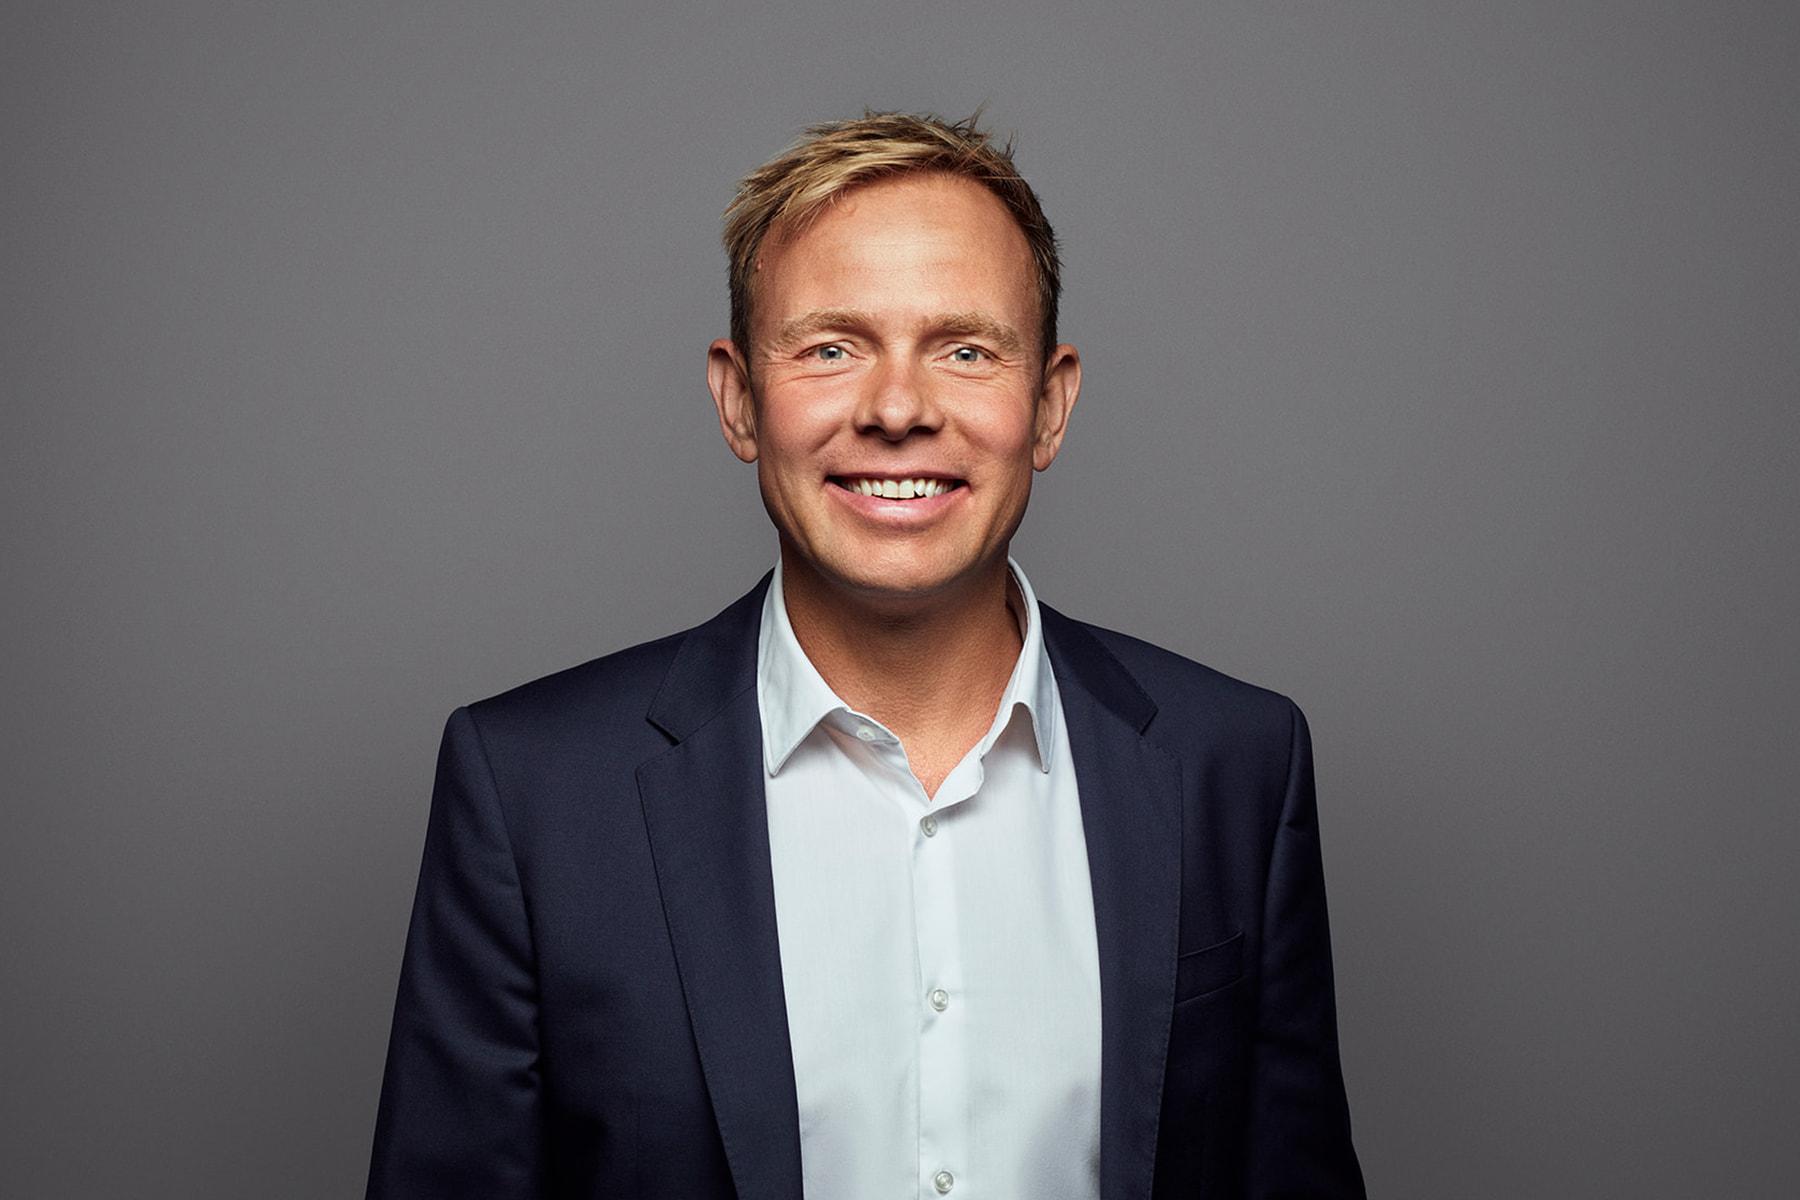 Thomas Resized Profile Pictures